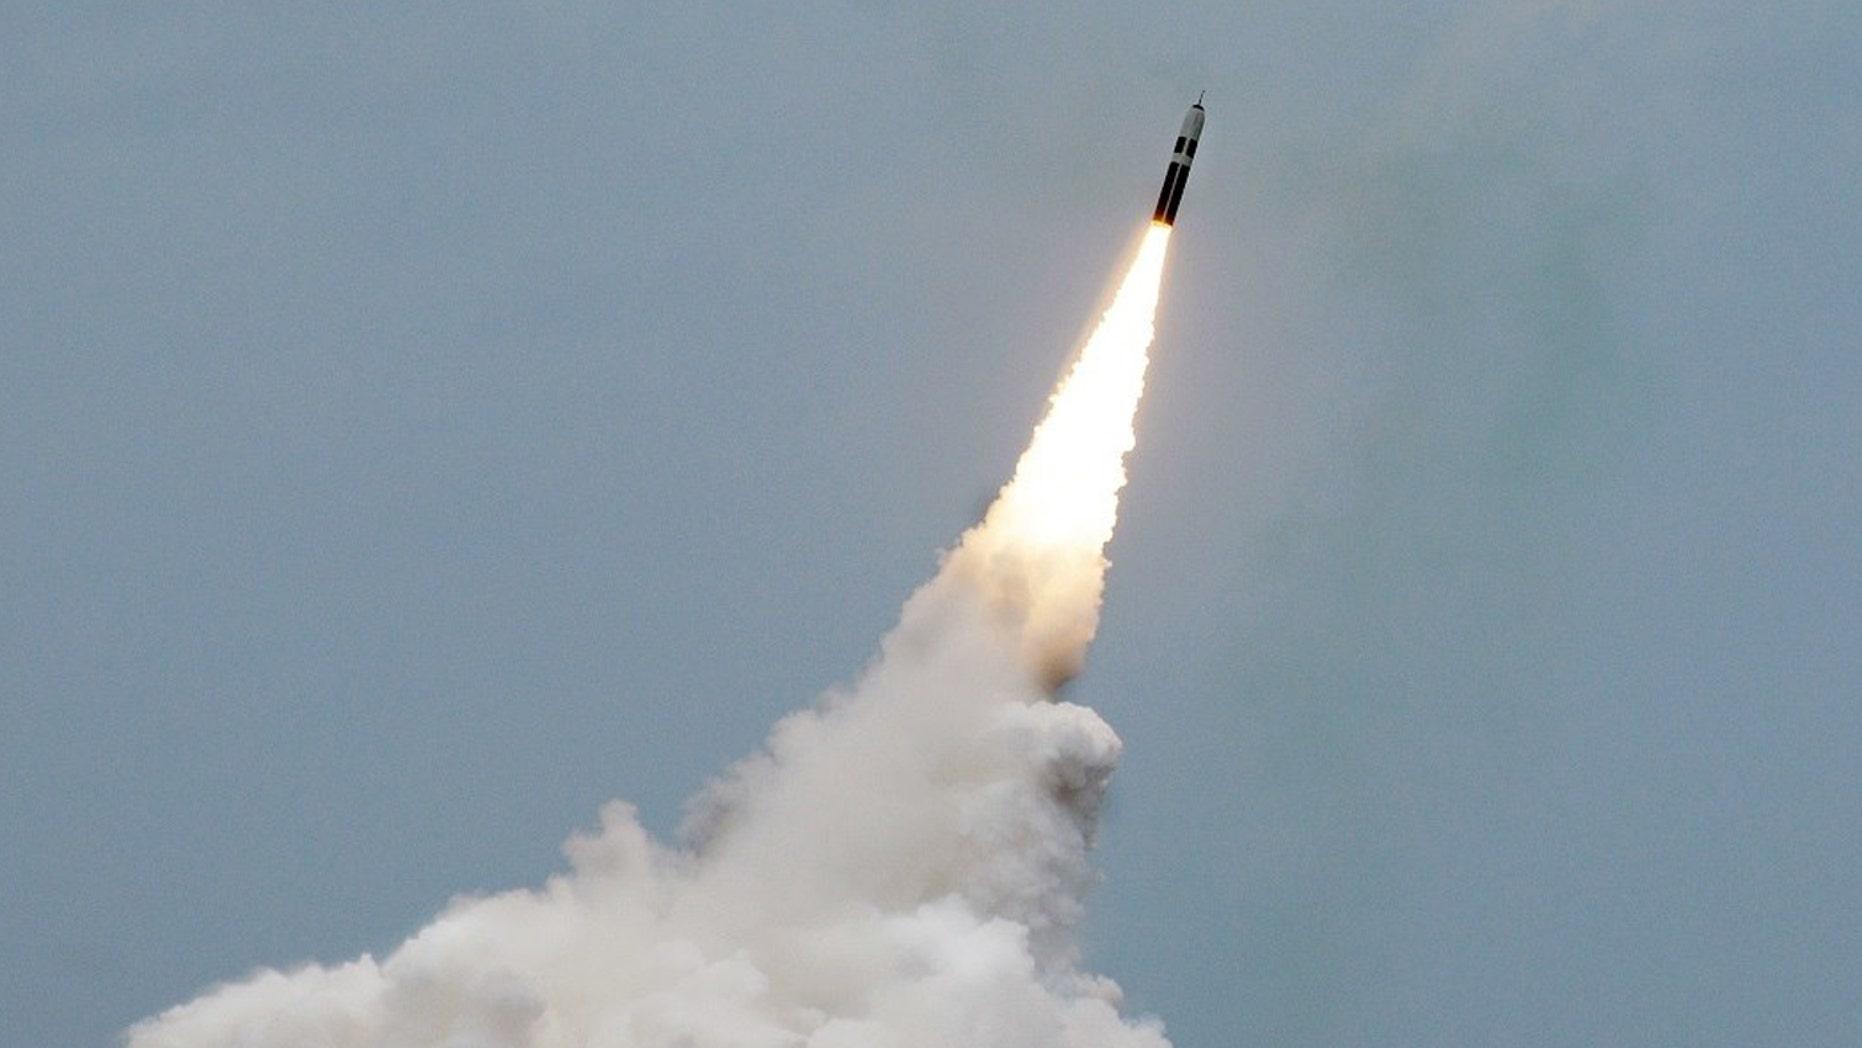 U.S. Navy Fields W76-2 Low-Yield Sub-Launched Nuclear Warhead